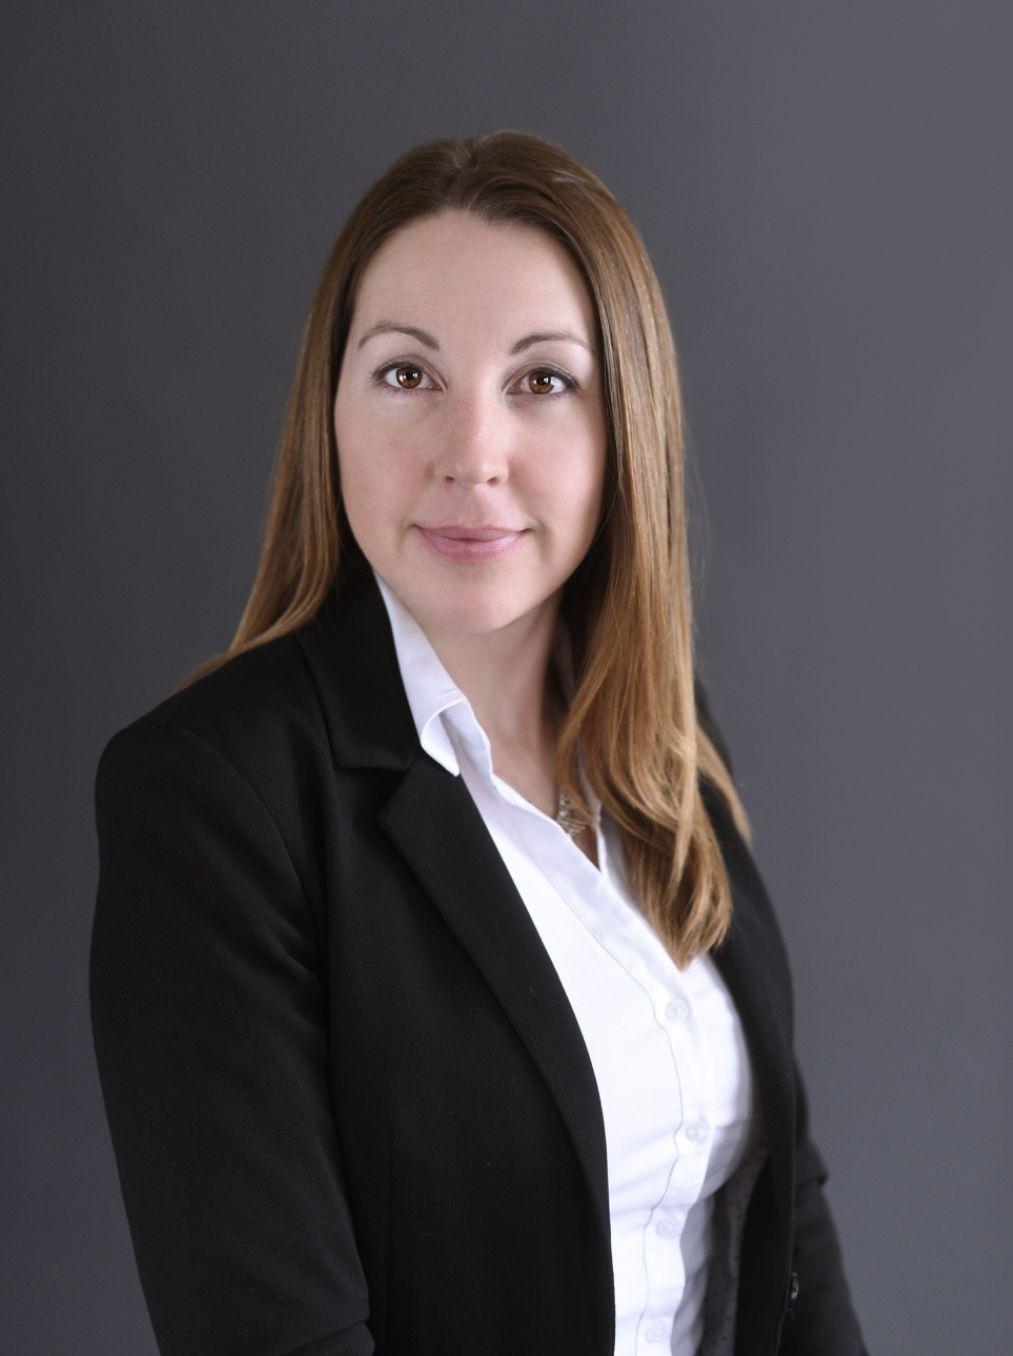 Jennifer Tresco